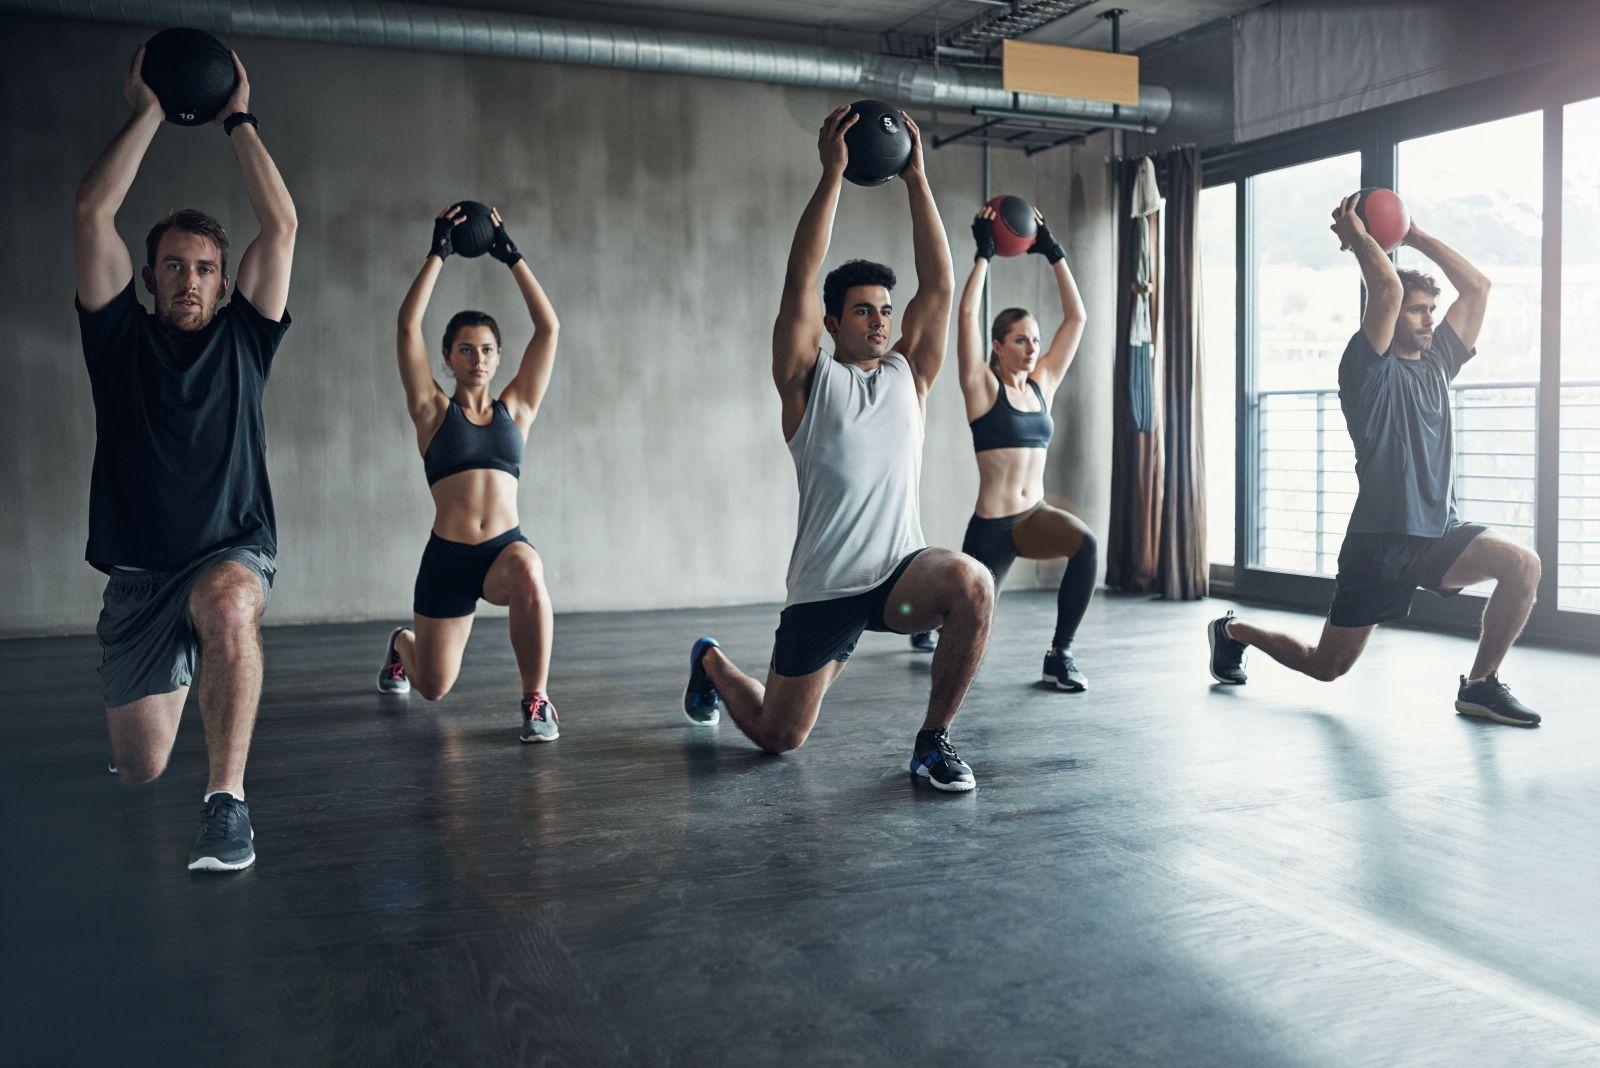 Jika Anda masih pemula dalam latihan kebugaran, maka pasti merasakan perubahan di tubuh Anda.